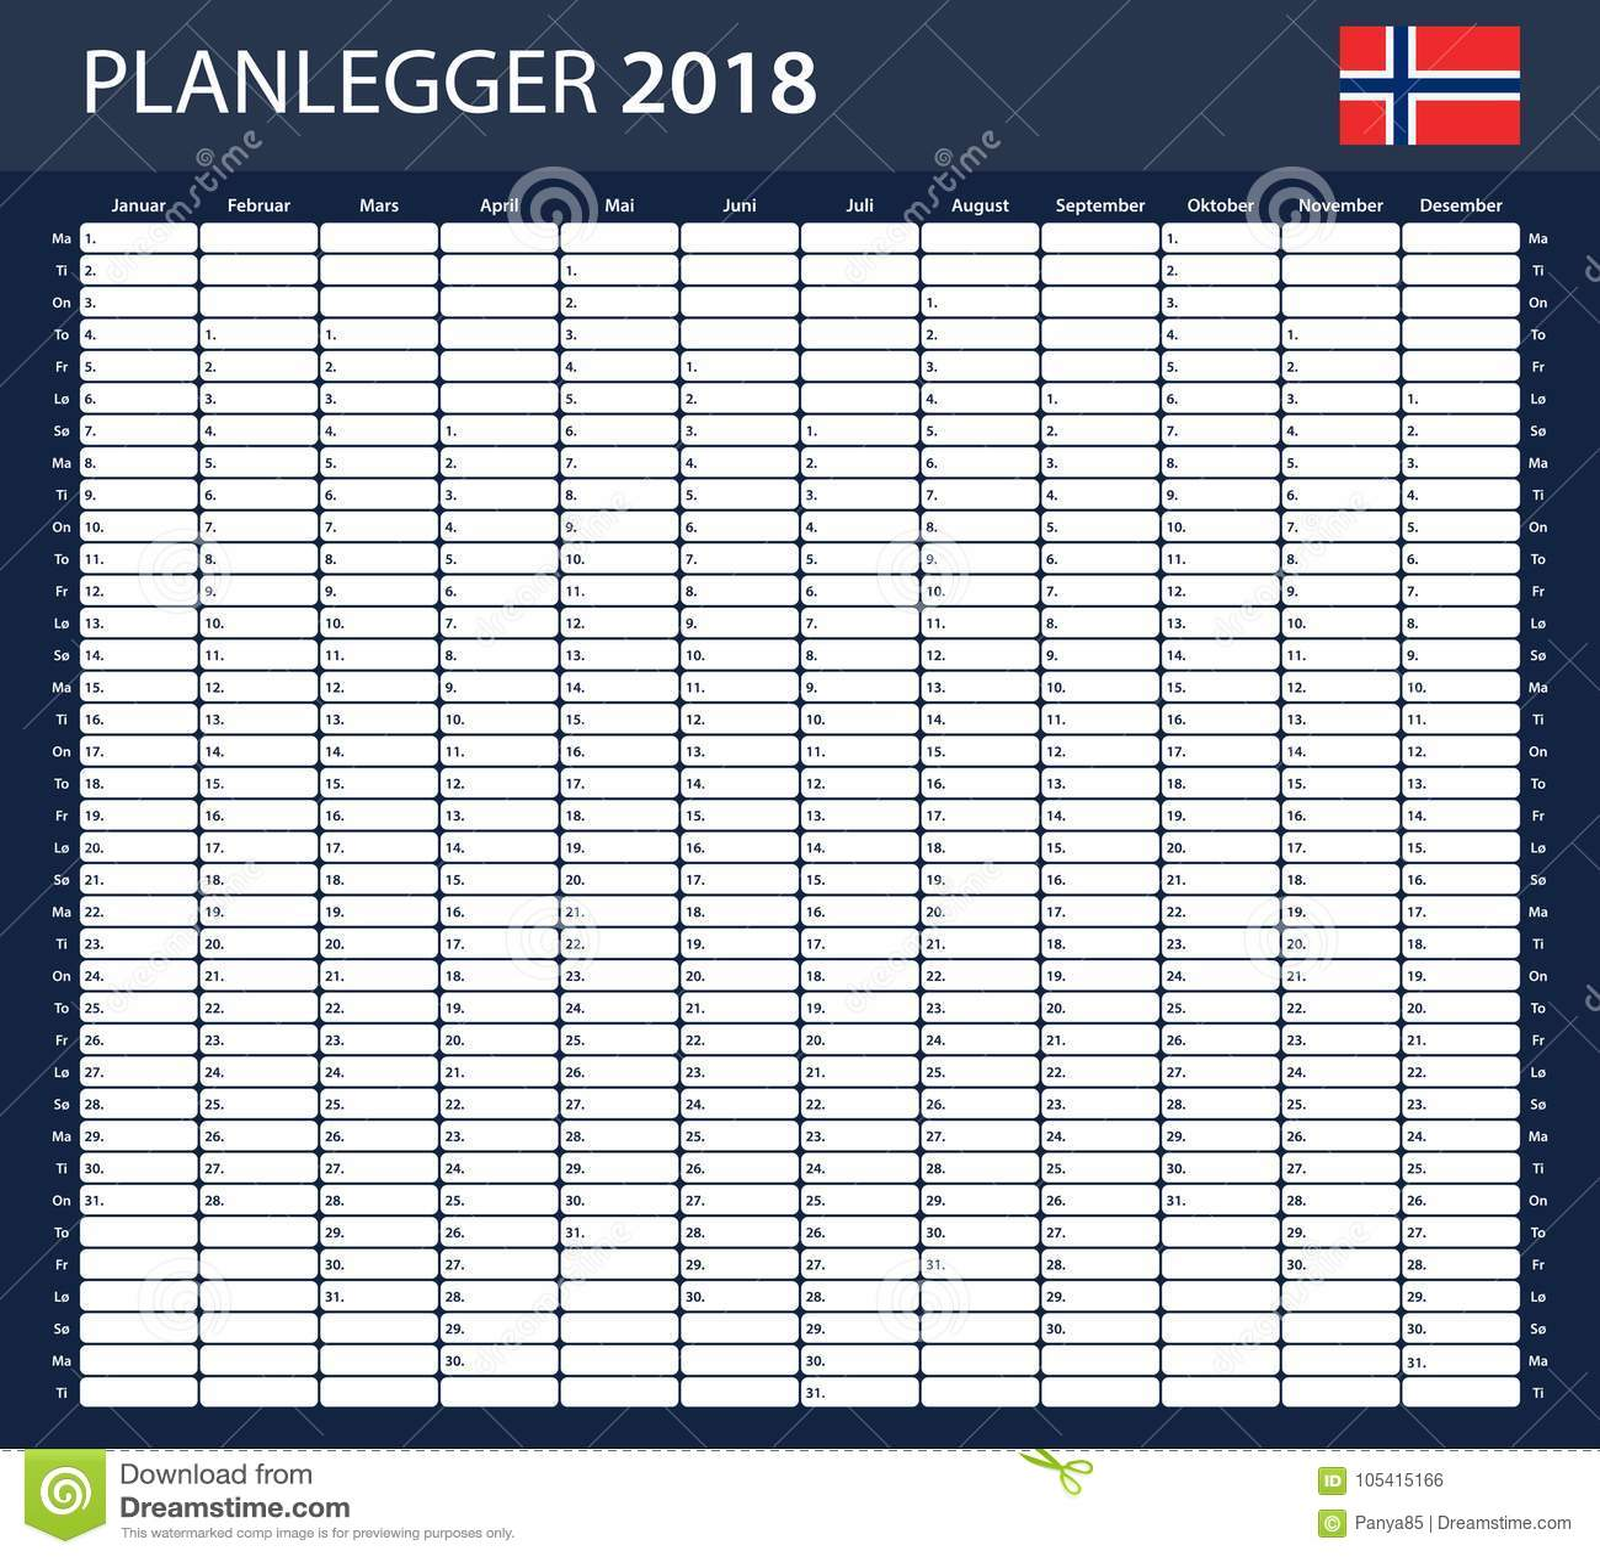 norwegian planner blank for 2018 scheduler agenda or diary